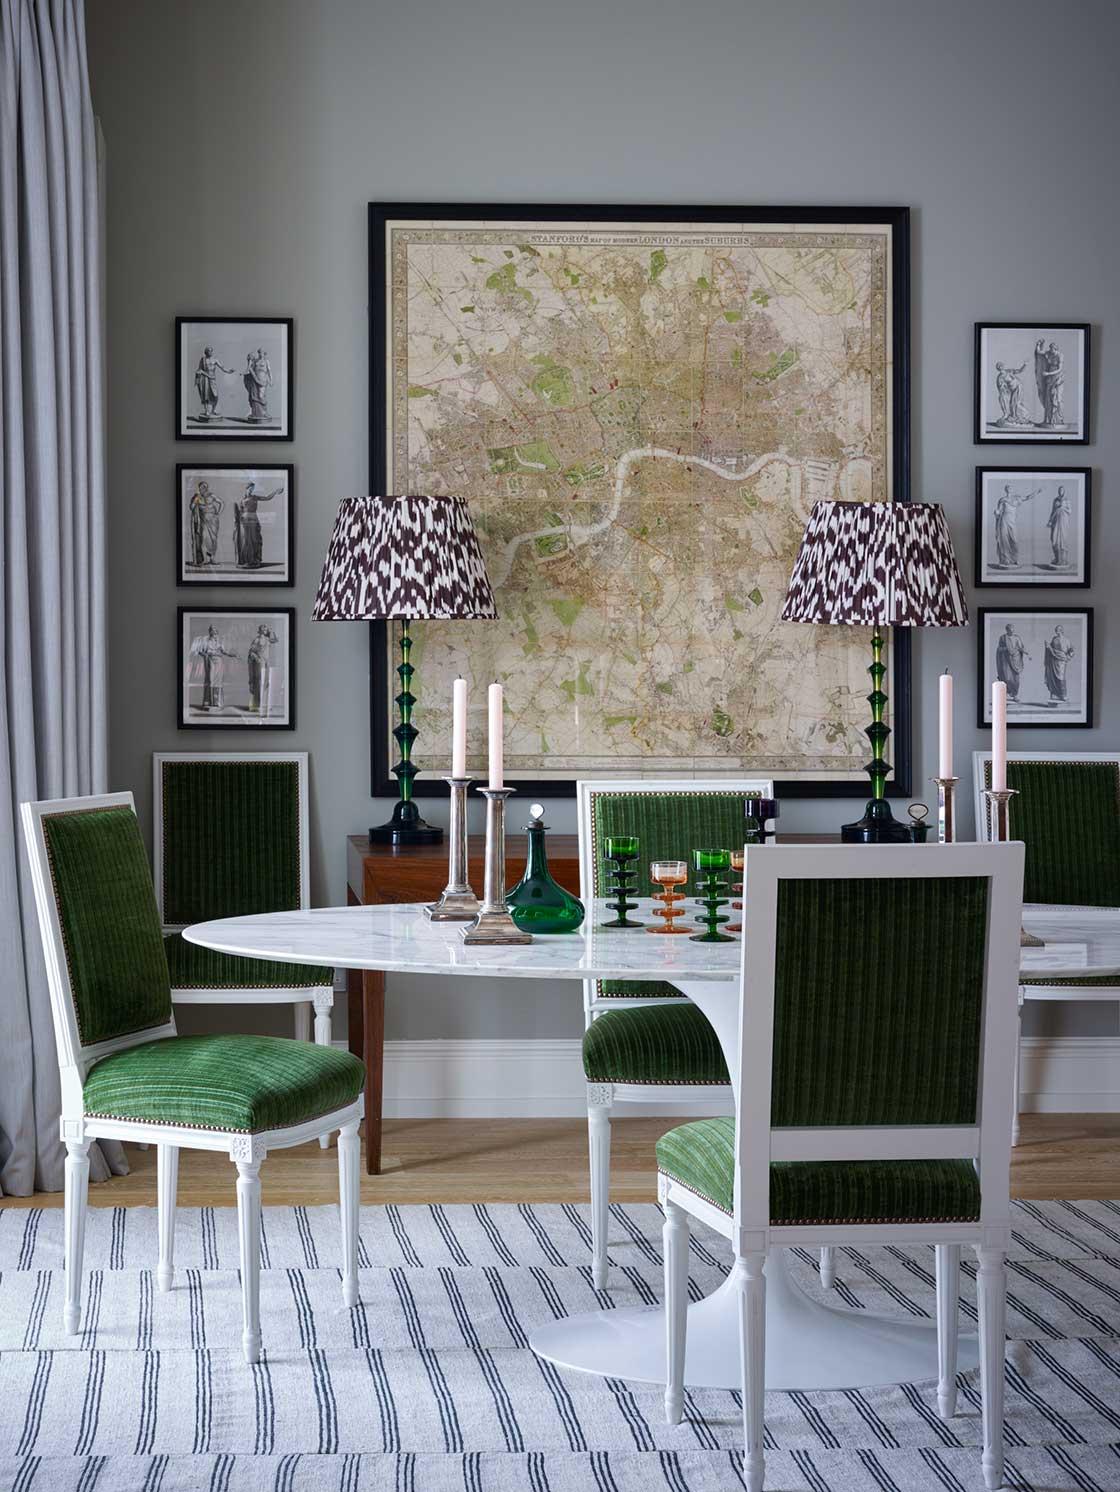 11-drayton-gardens-london-ben-pentreath-interior-l